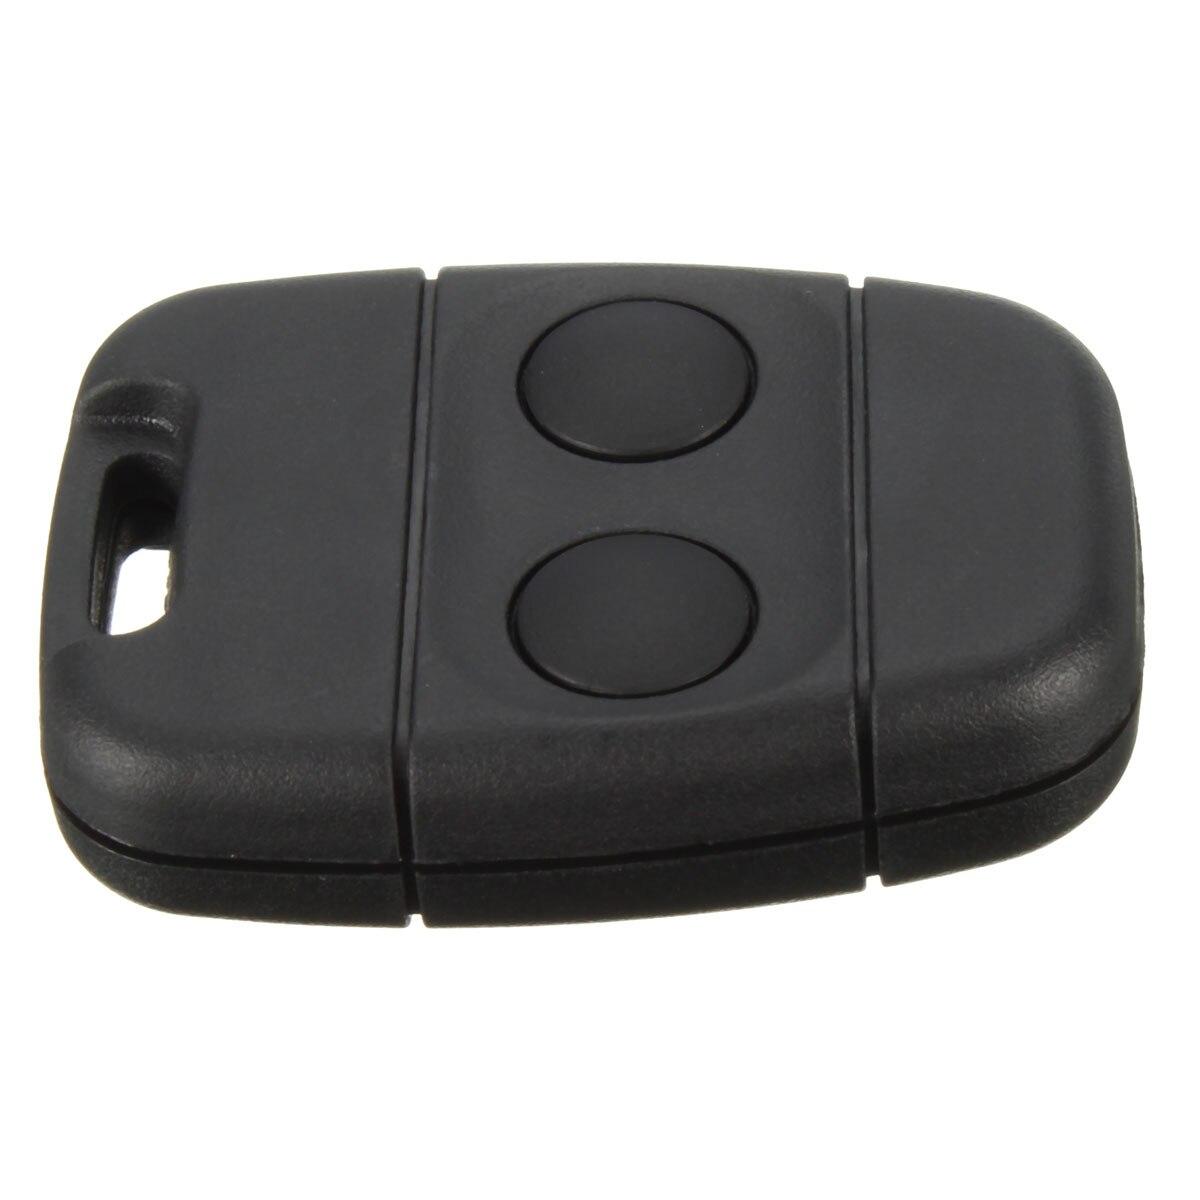 2 Button Car Remote Key Fob Repair Kit for Land Rover Freelander Defender Discovery for Lucas Type Remotes 3TXA 3TXB 3TXC 3TXD 1